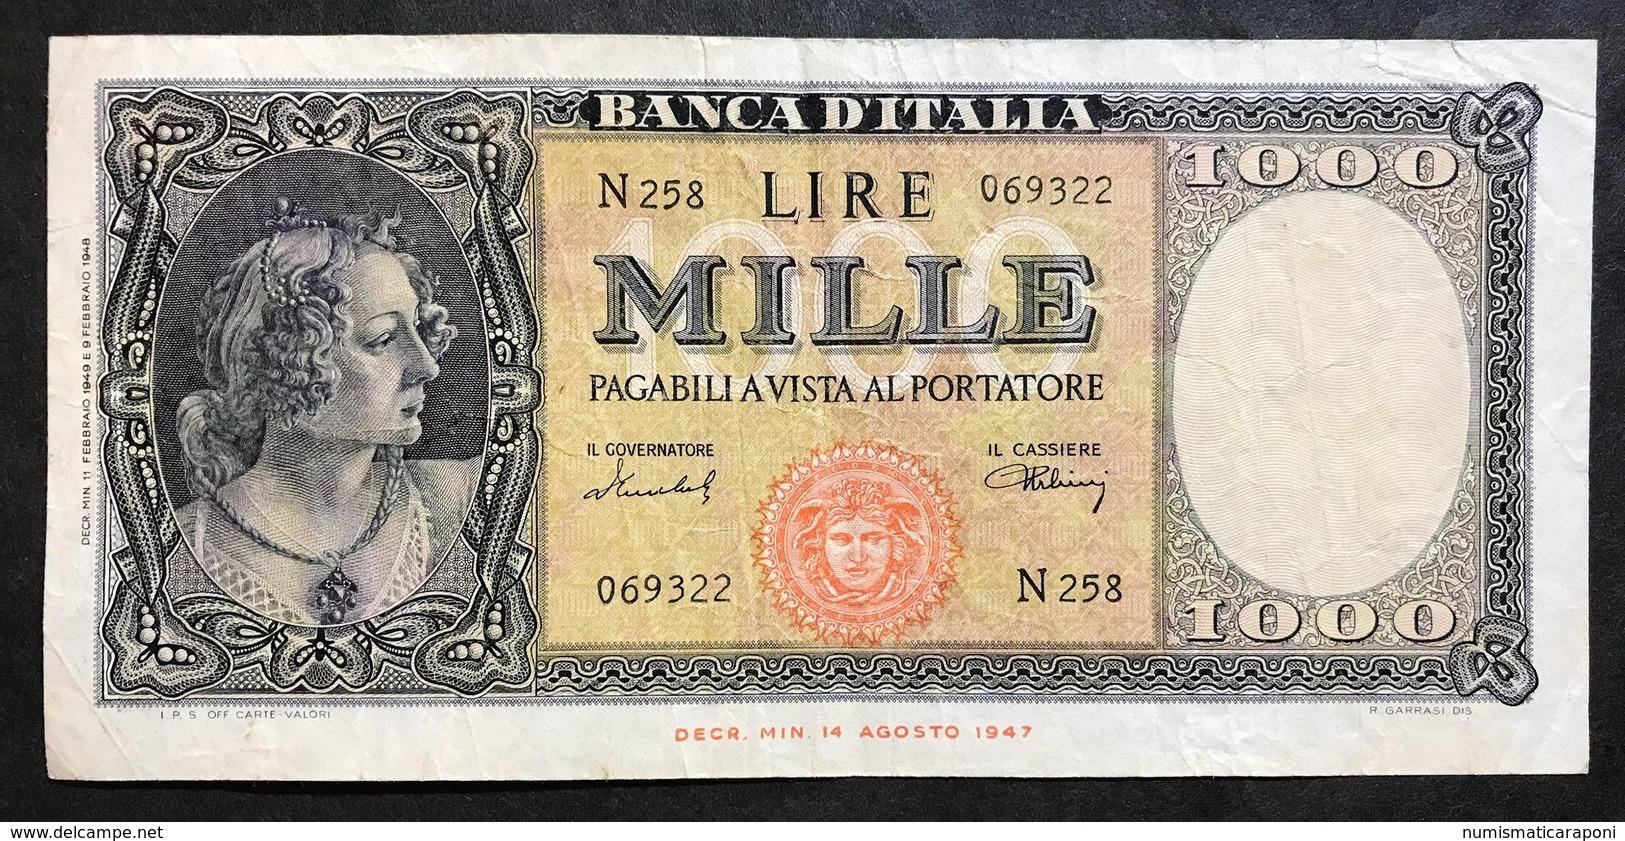 1000 LIRE Italia Medusa 11 02 1949 Raro Bb Naturale LOTTO 519 - 1000 Lire